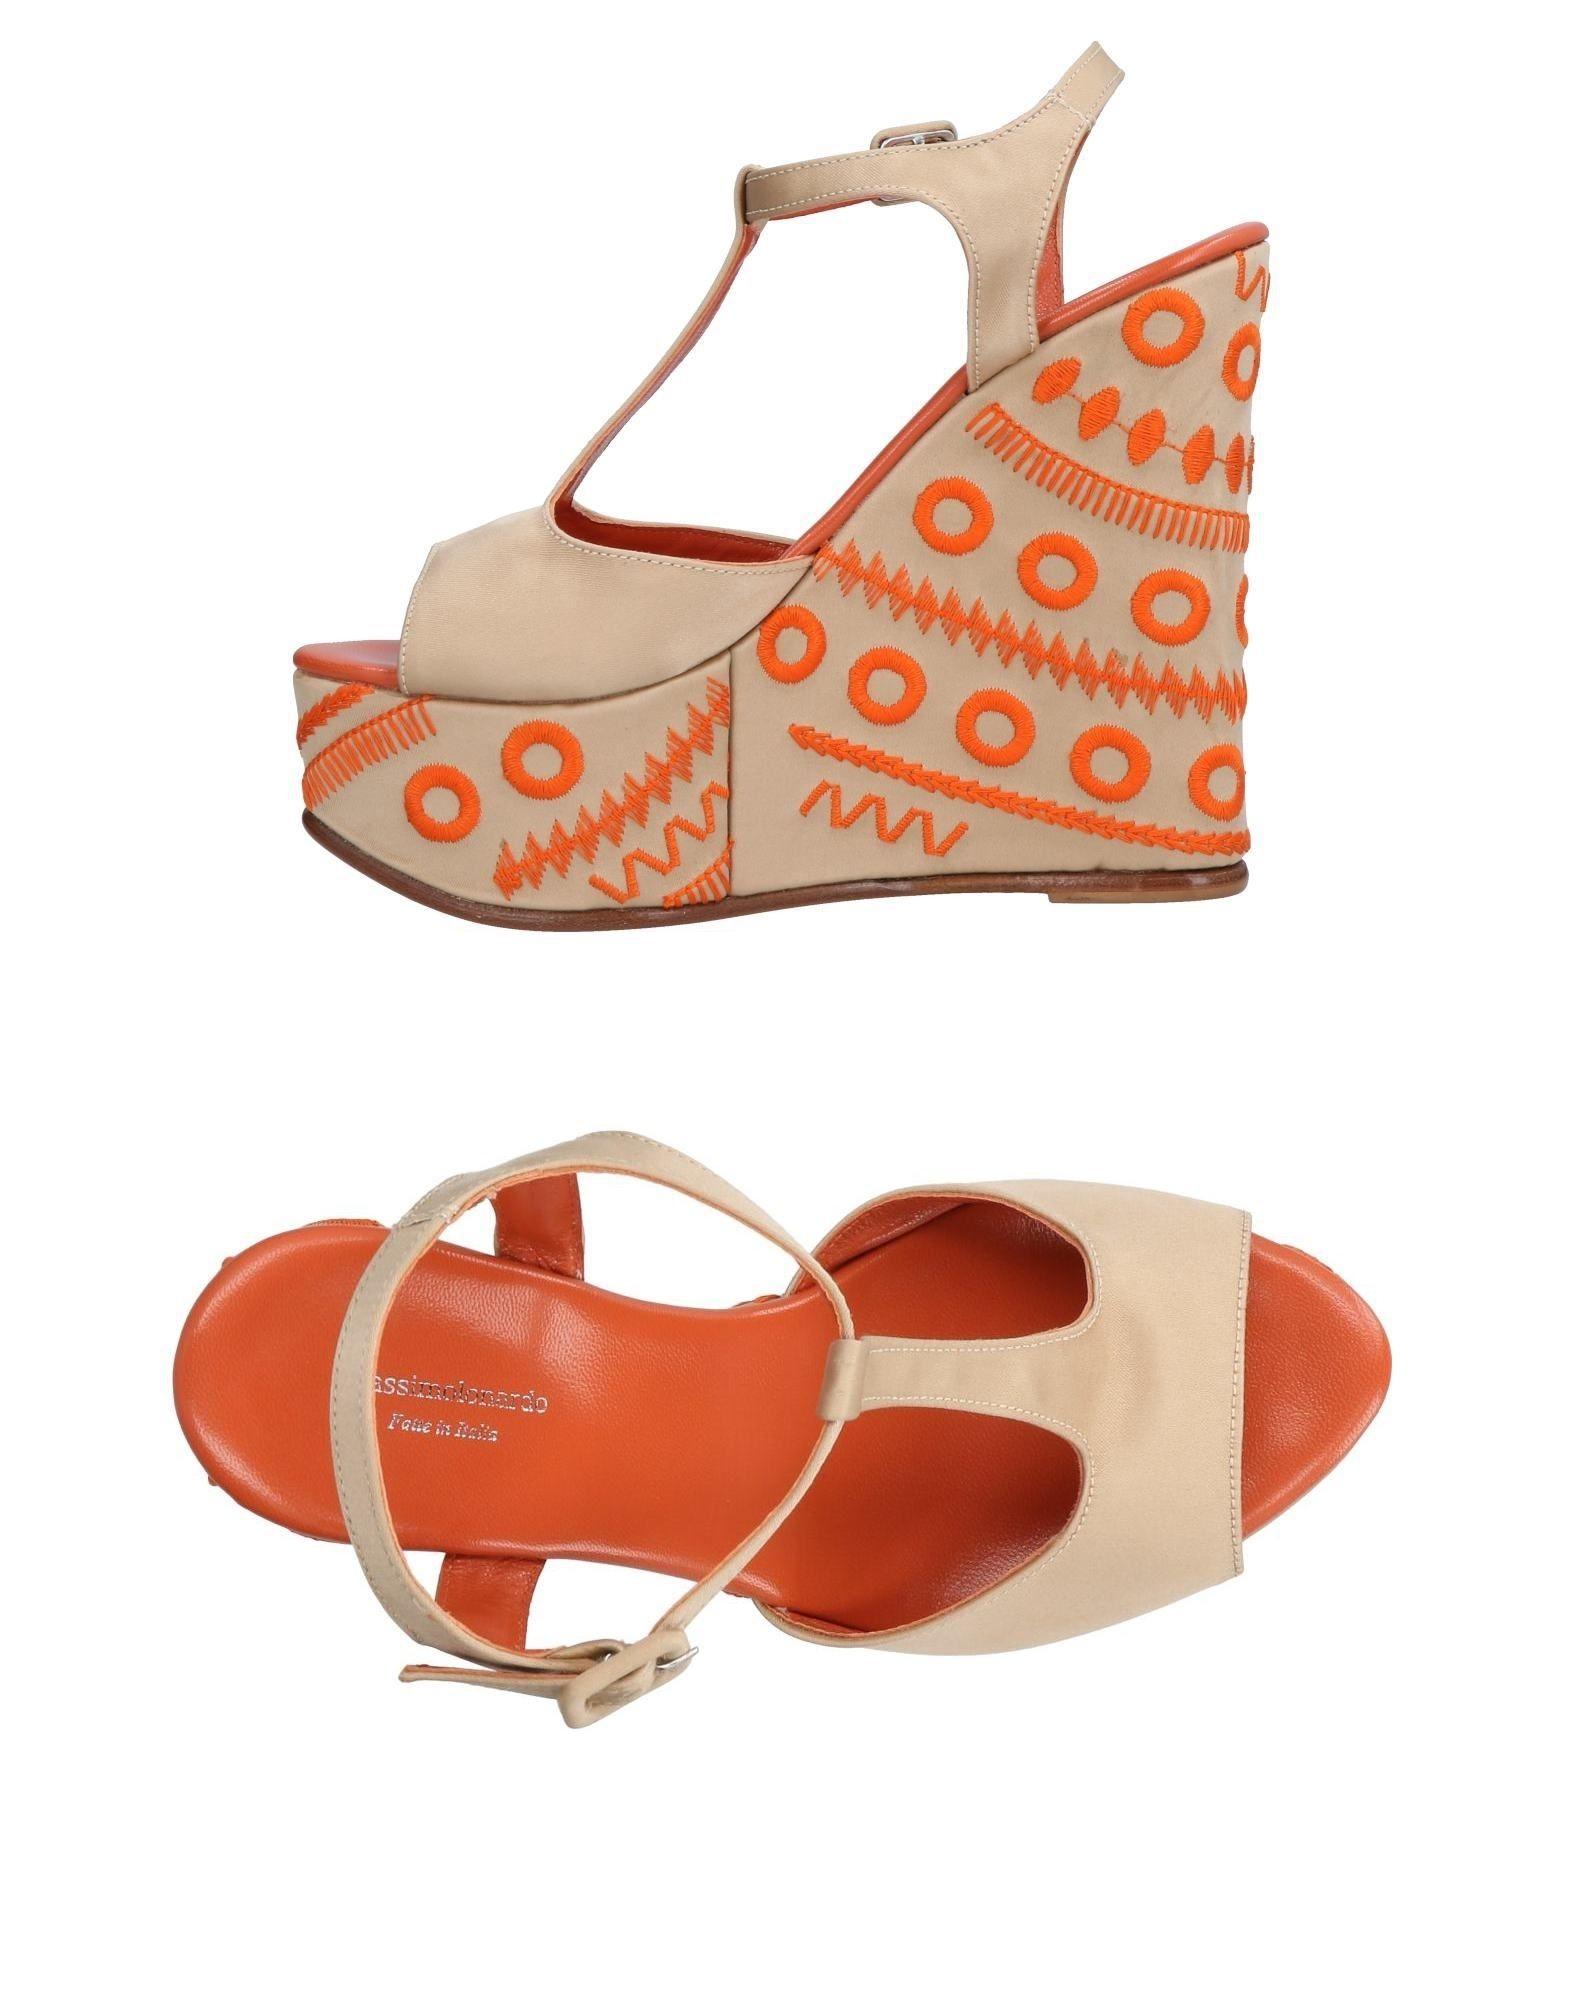 Massimo Lonardo Sandals - Women on Massimo Lonardo Sandals online on Women  Australia - 11471760QO 2a1fdf